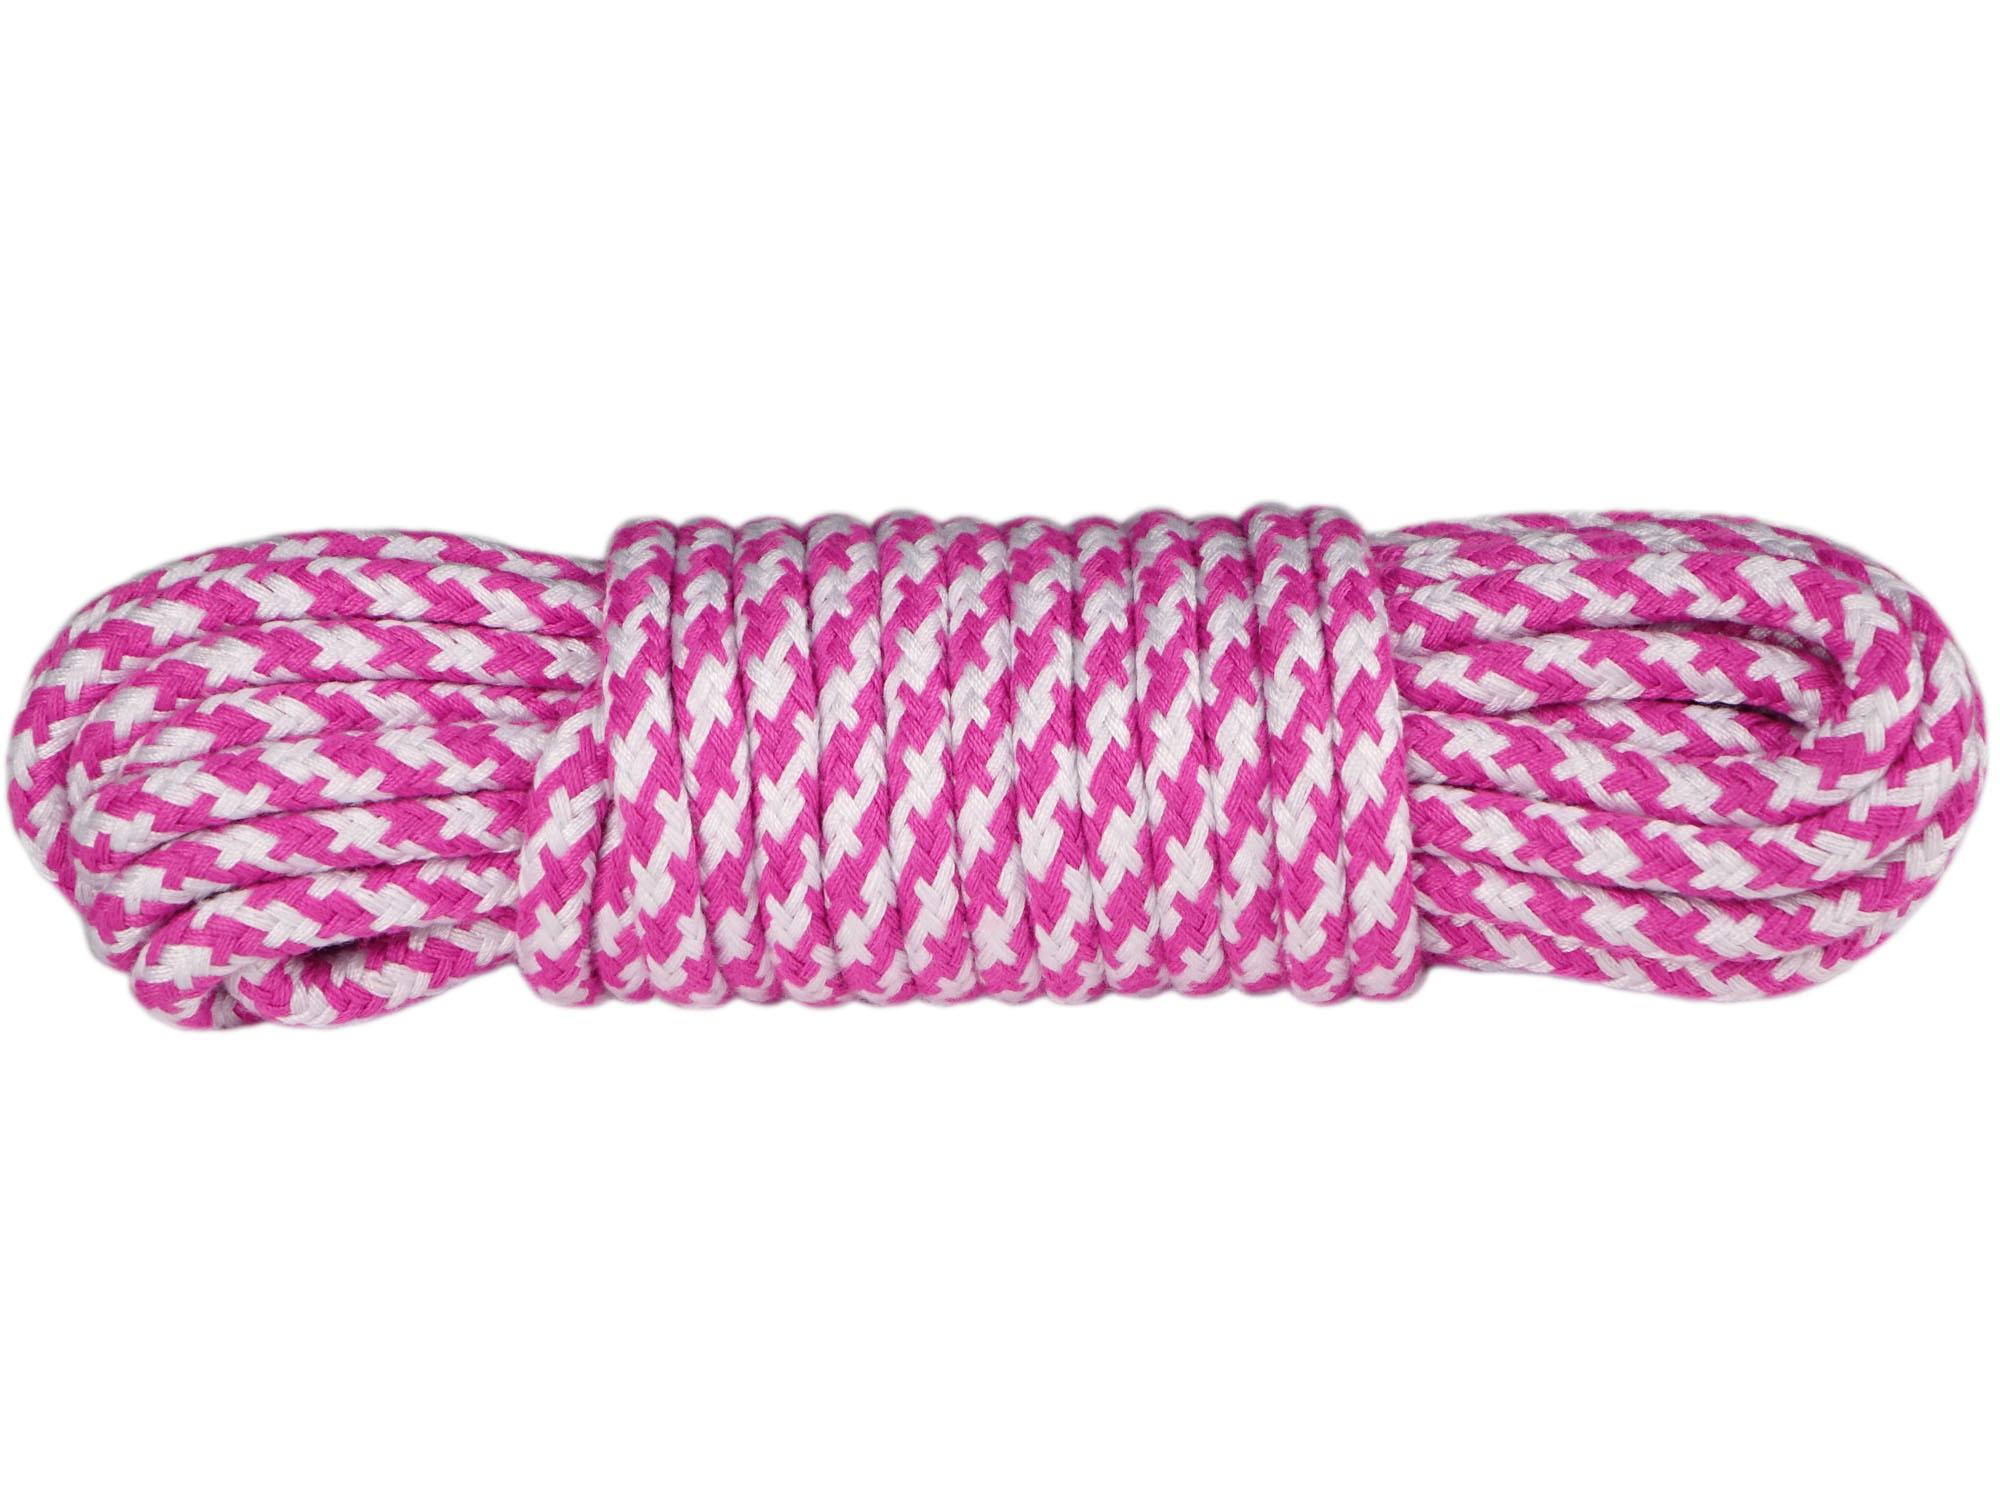 10m Bondageseil 2-farbig Pink Weiß